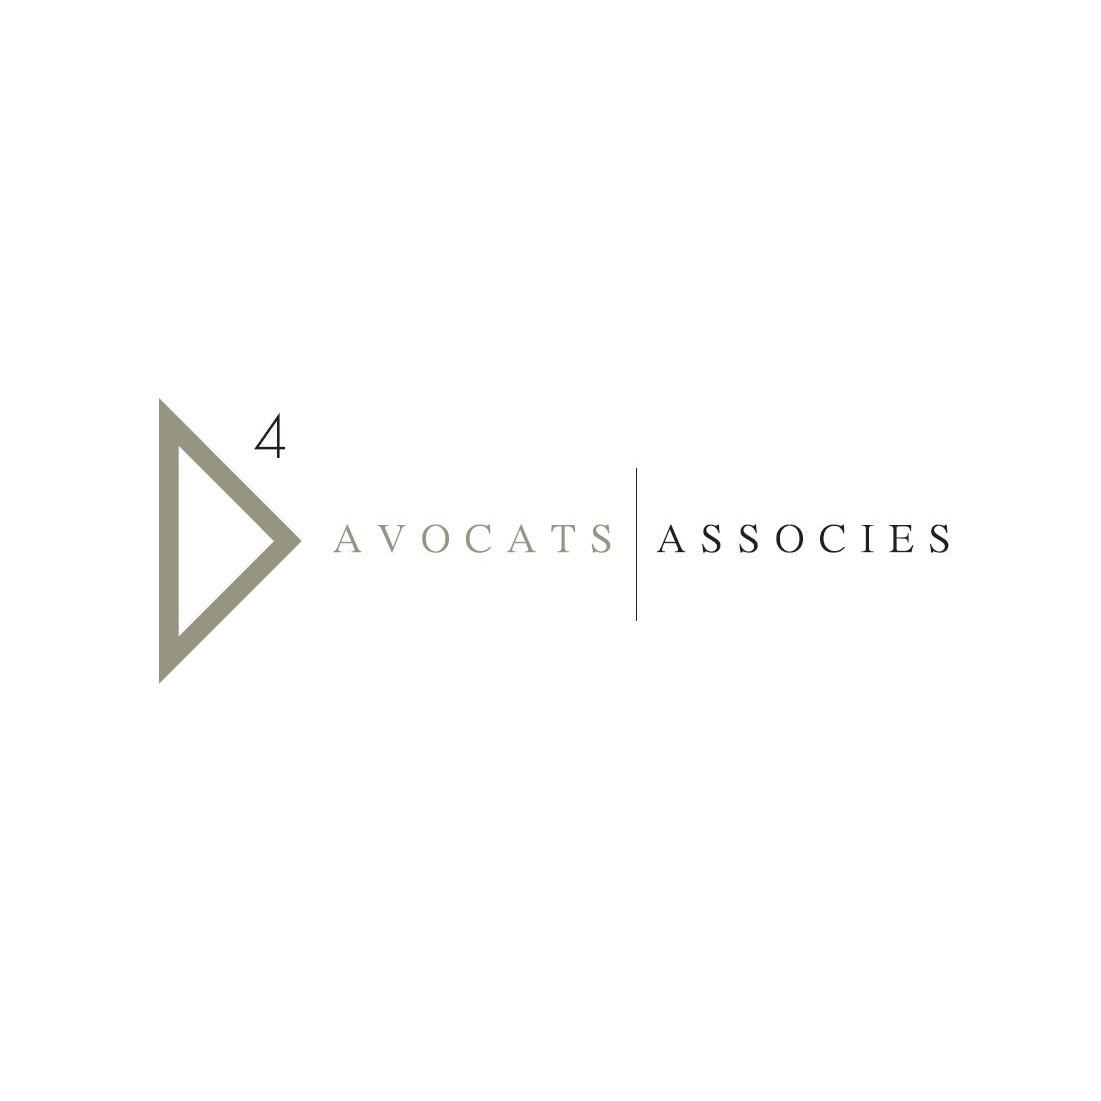 the D4 Avocats Associes logo.